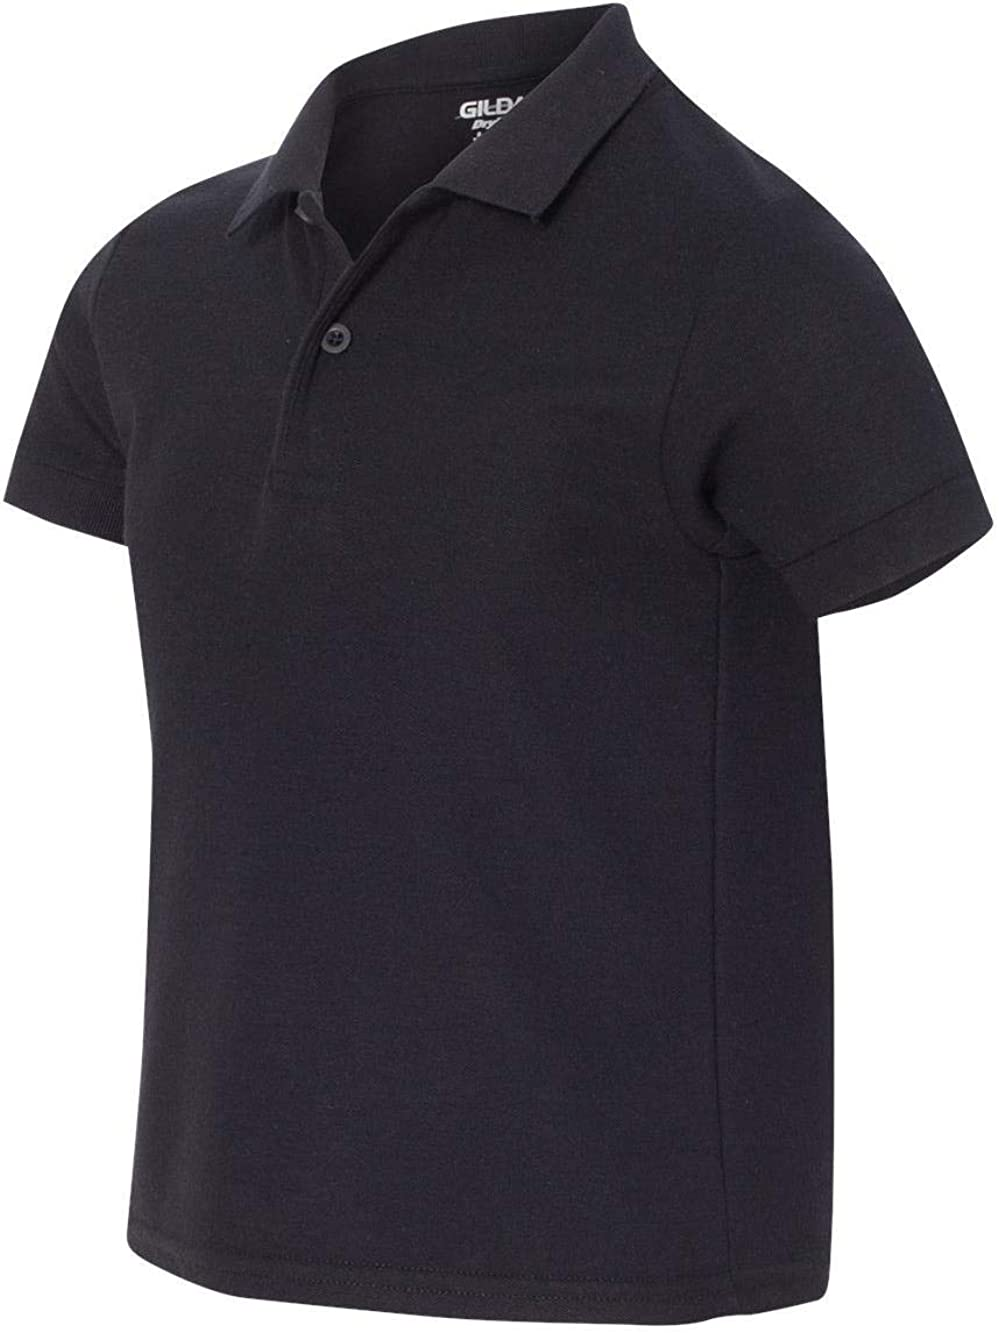 Gildan - Youth DryBlend Double Pique Polo Shirt - 72800B-Black-L